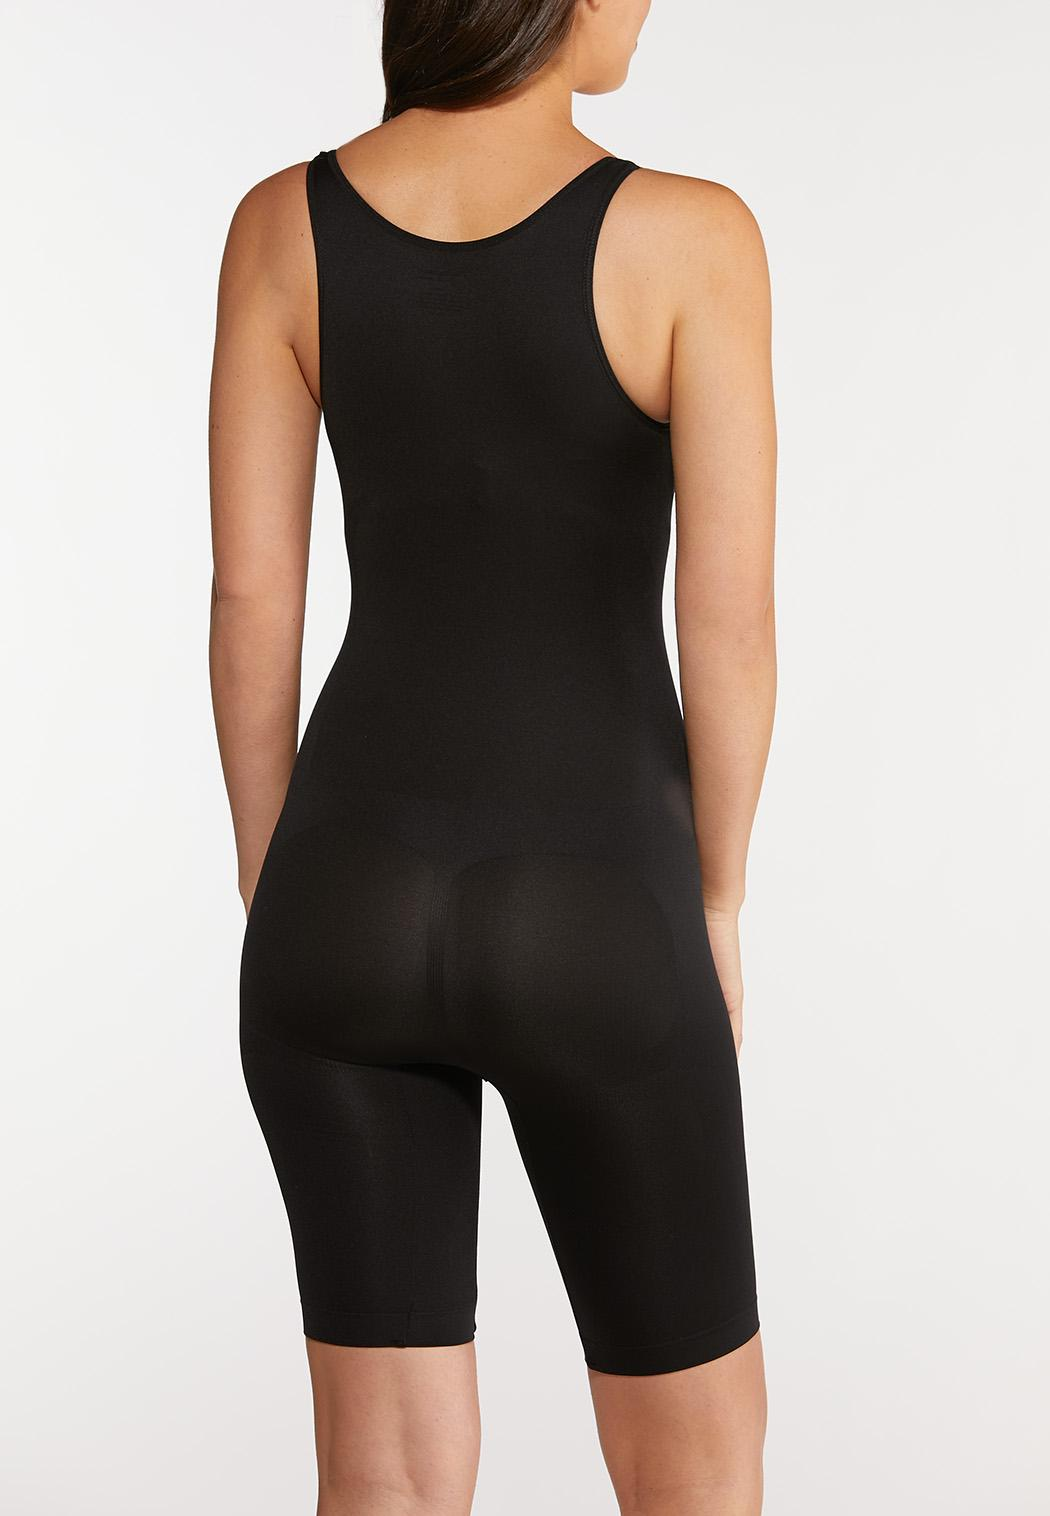 Seamless Shaping Bodysuit (Item #43958325)